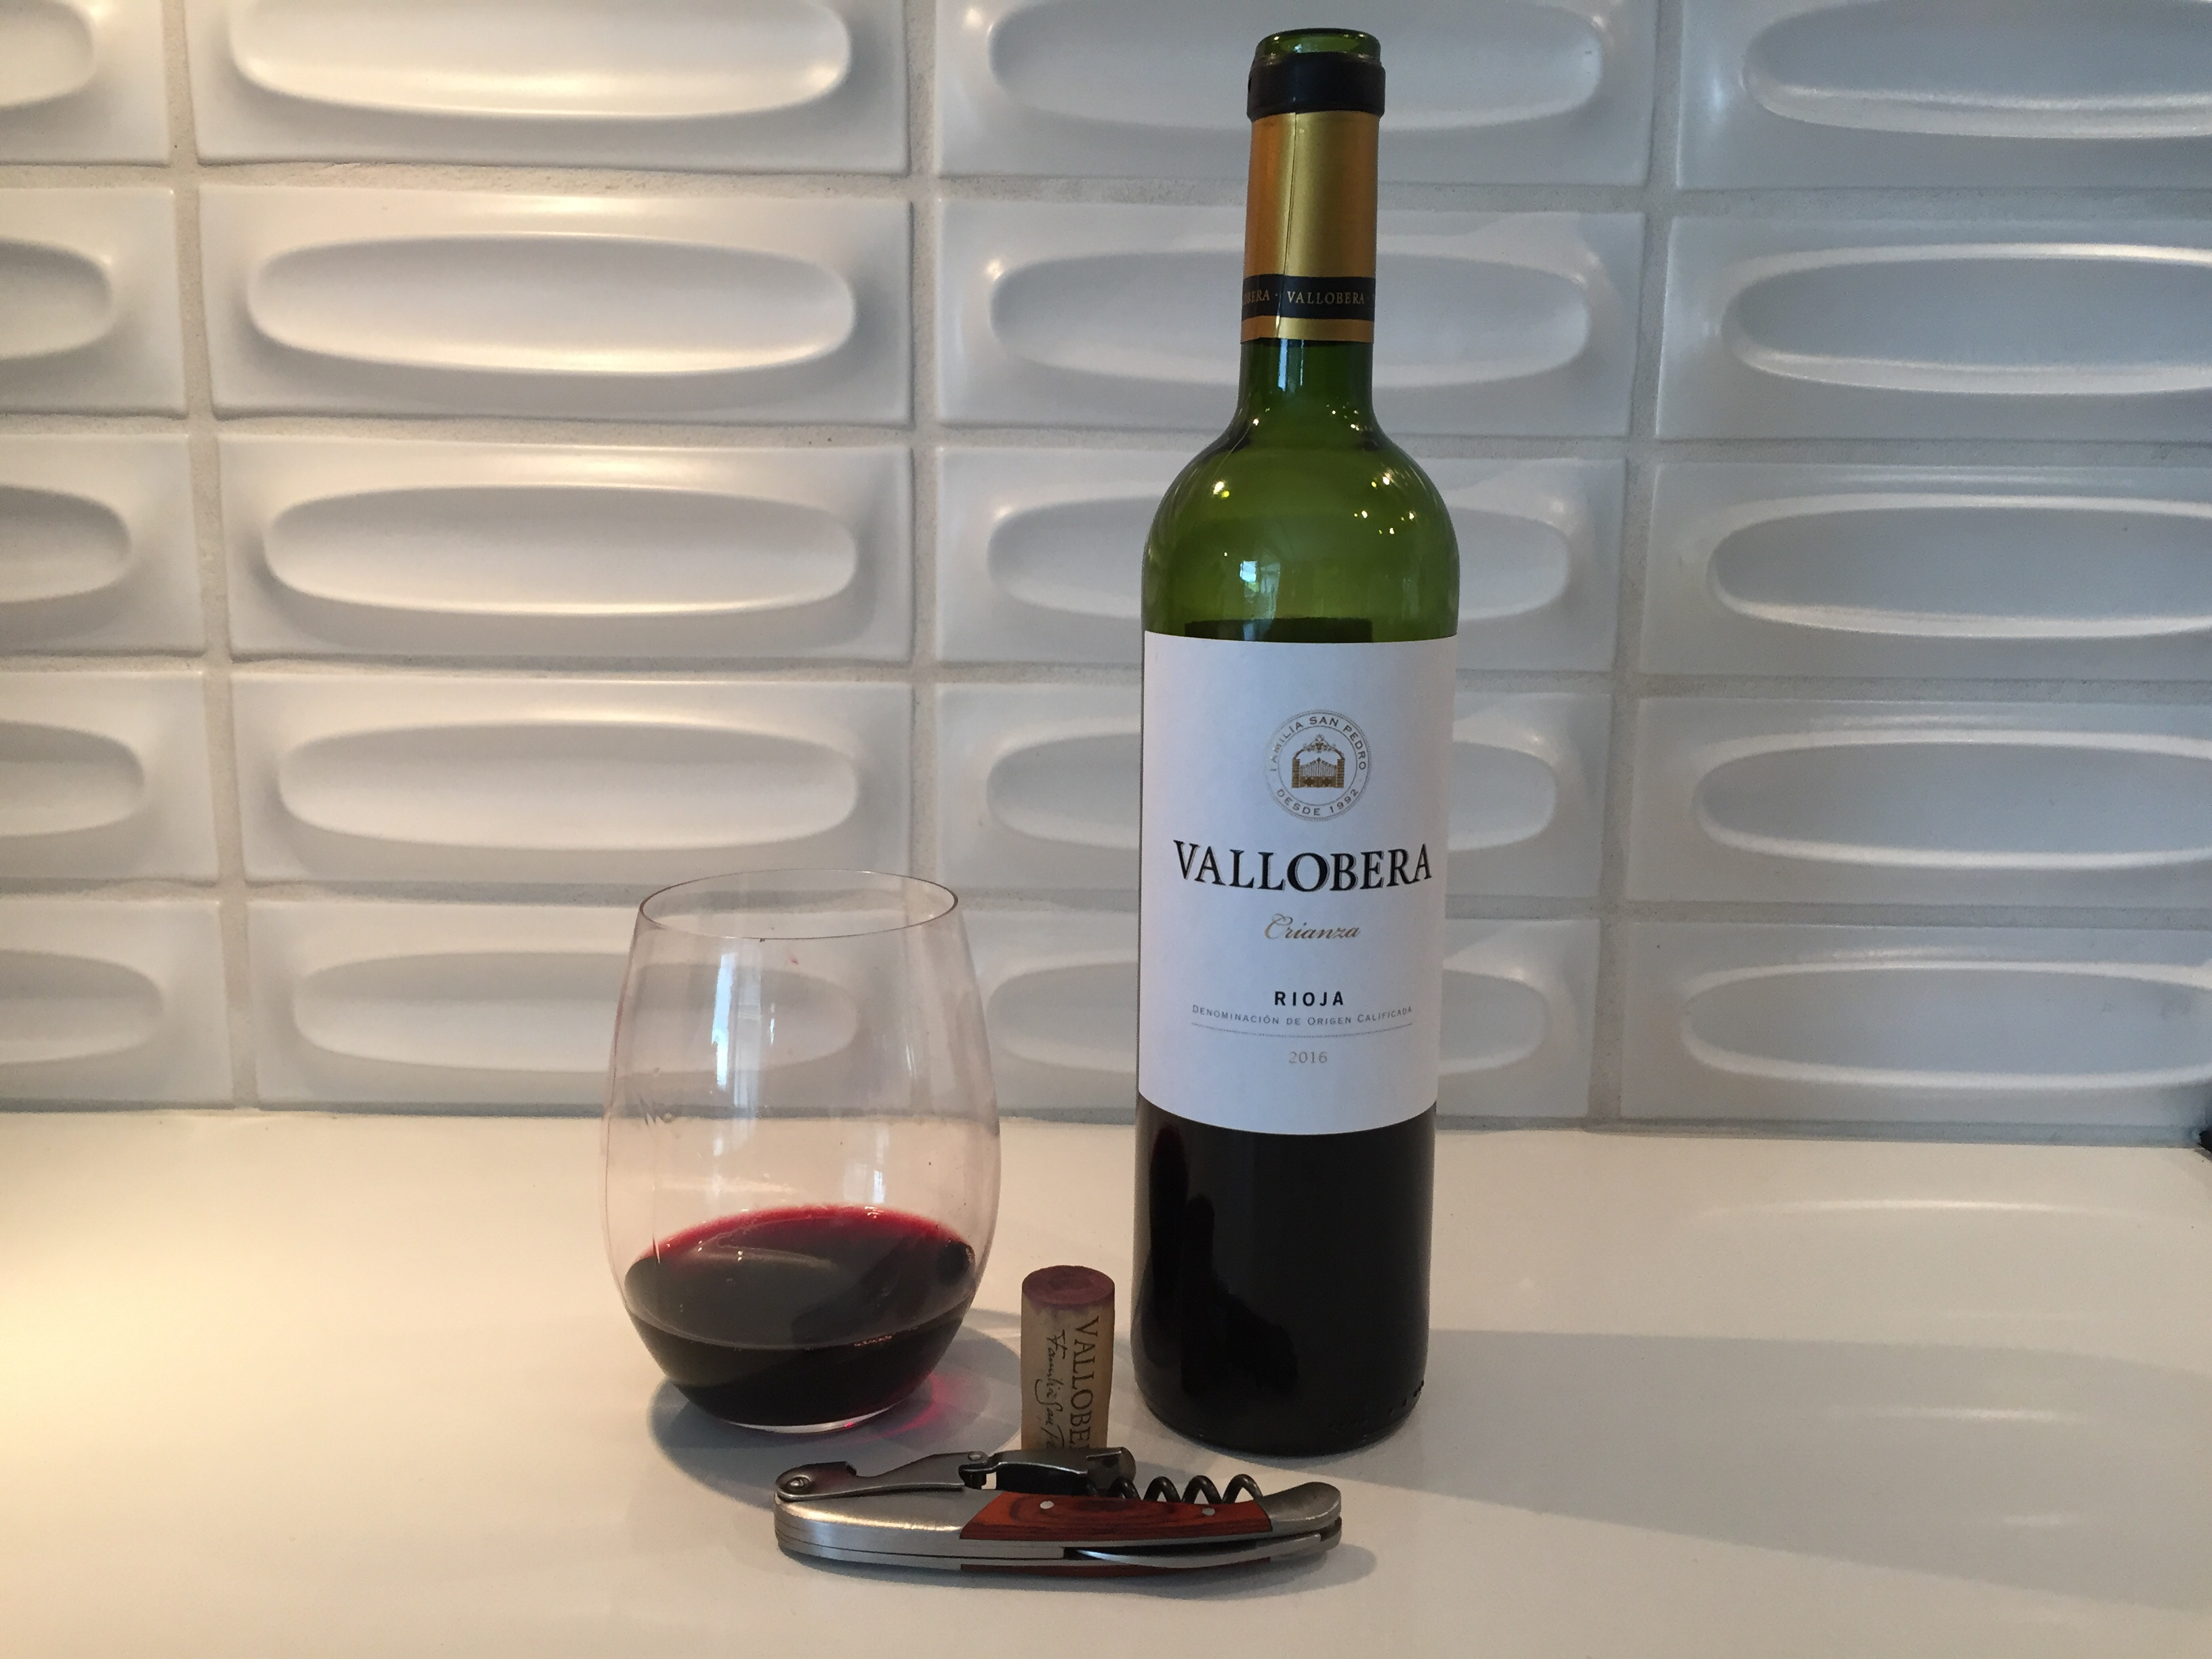 Glass and bottle of 2016 Vallobera Crianza Rioja